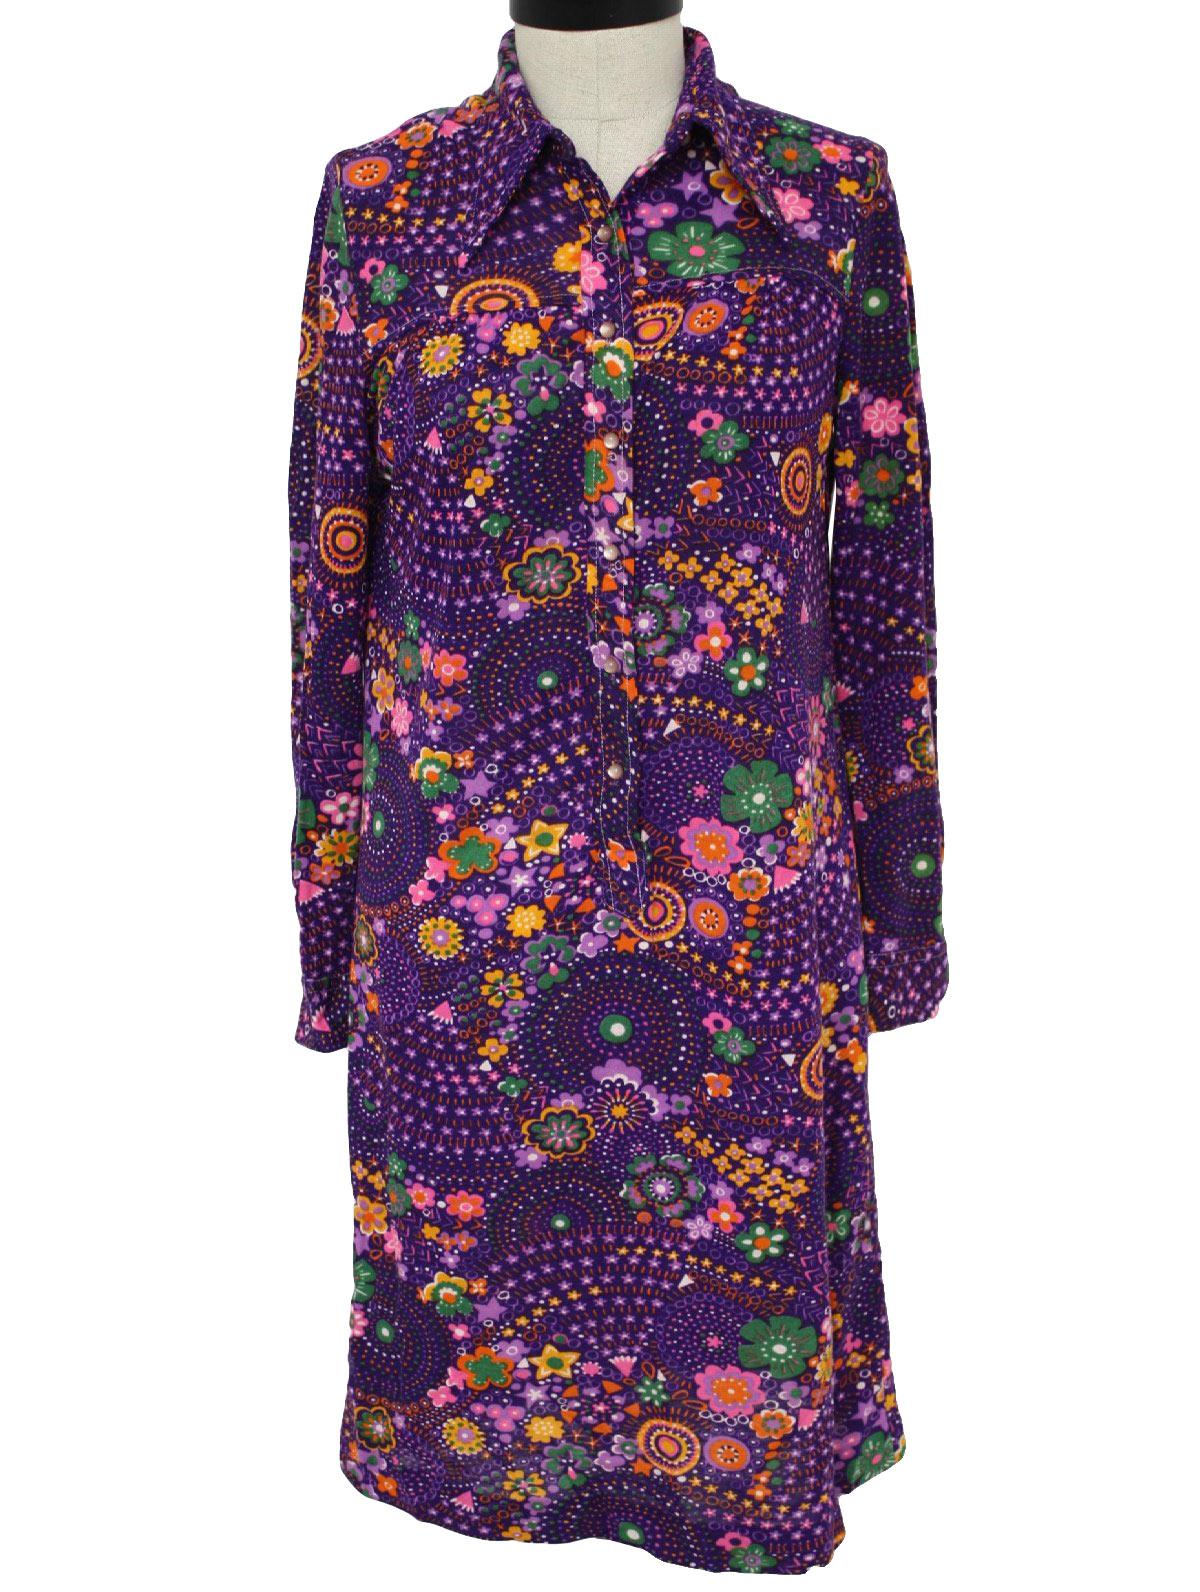 9ef3c94e198c Vintage The Art Shirt 70 s Dress  70s -The Art Shirt- Womens shades ...